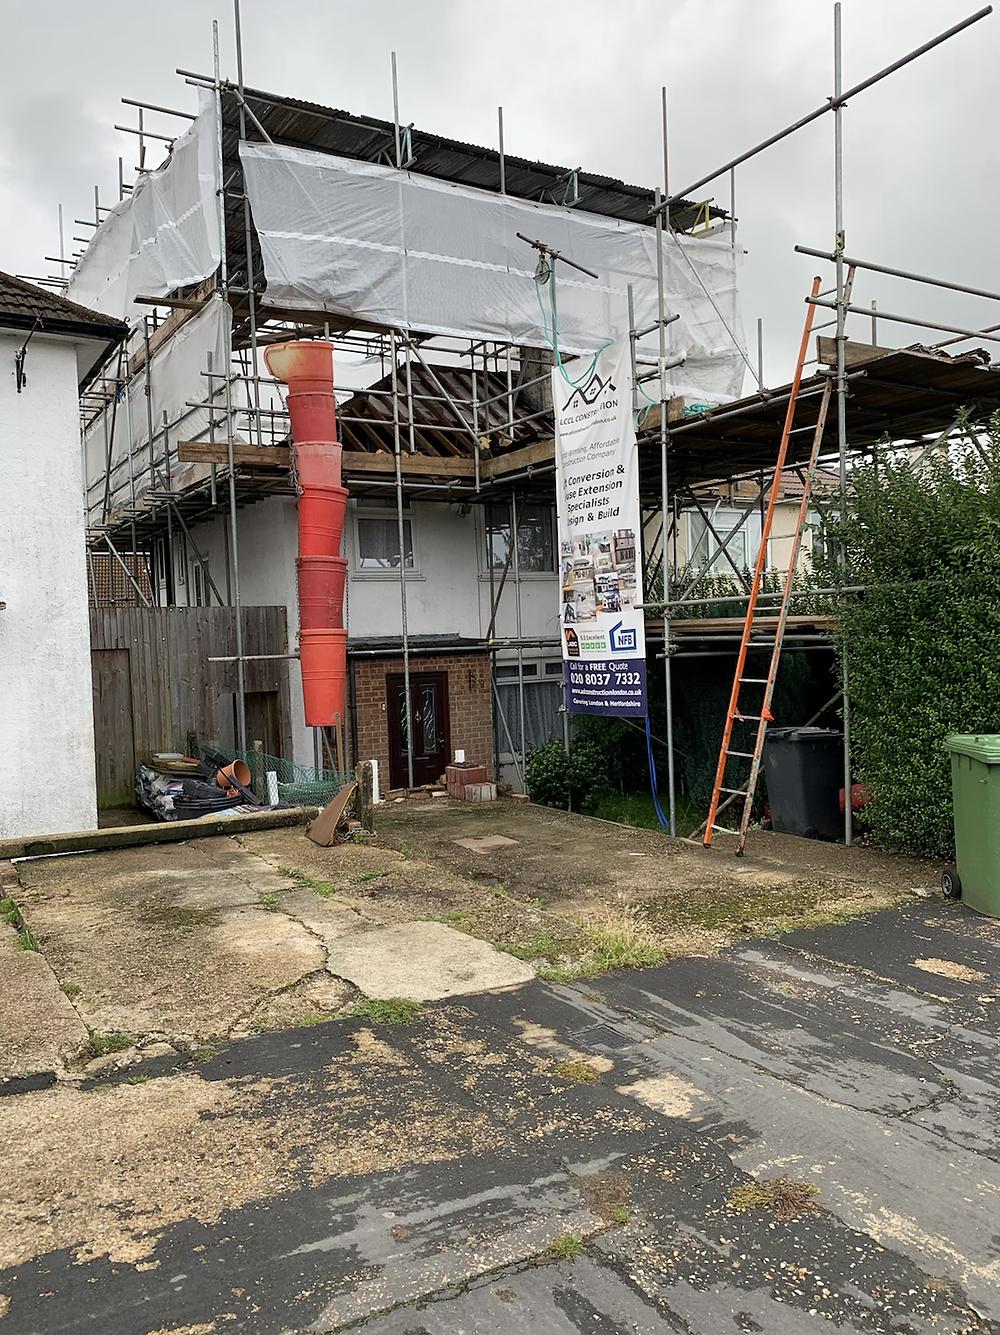 Loft conversion design and build Borehamwood, WD6 Hertfordshire